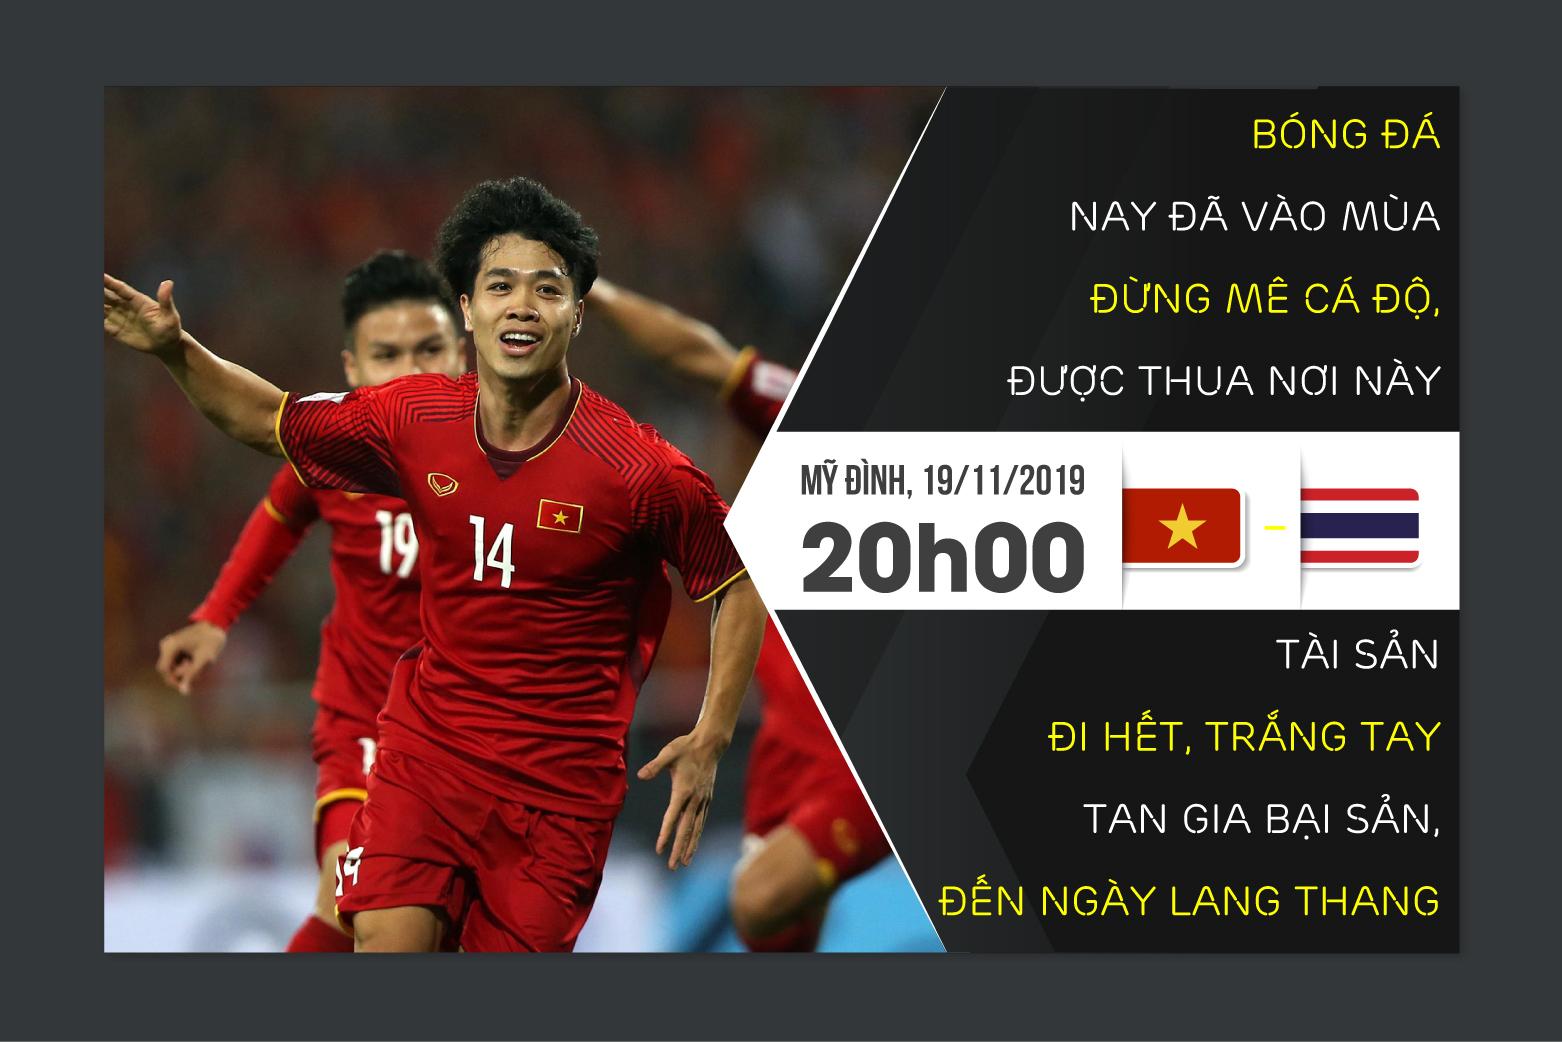 loi-dan-cua-cac-bac-tai-truoc-tran-cau-dinh-viet-nam-thai-lan